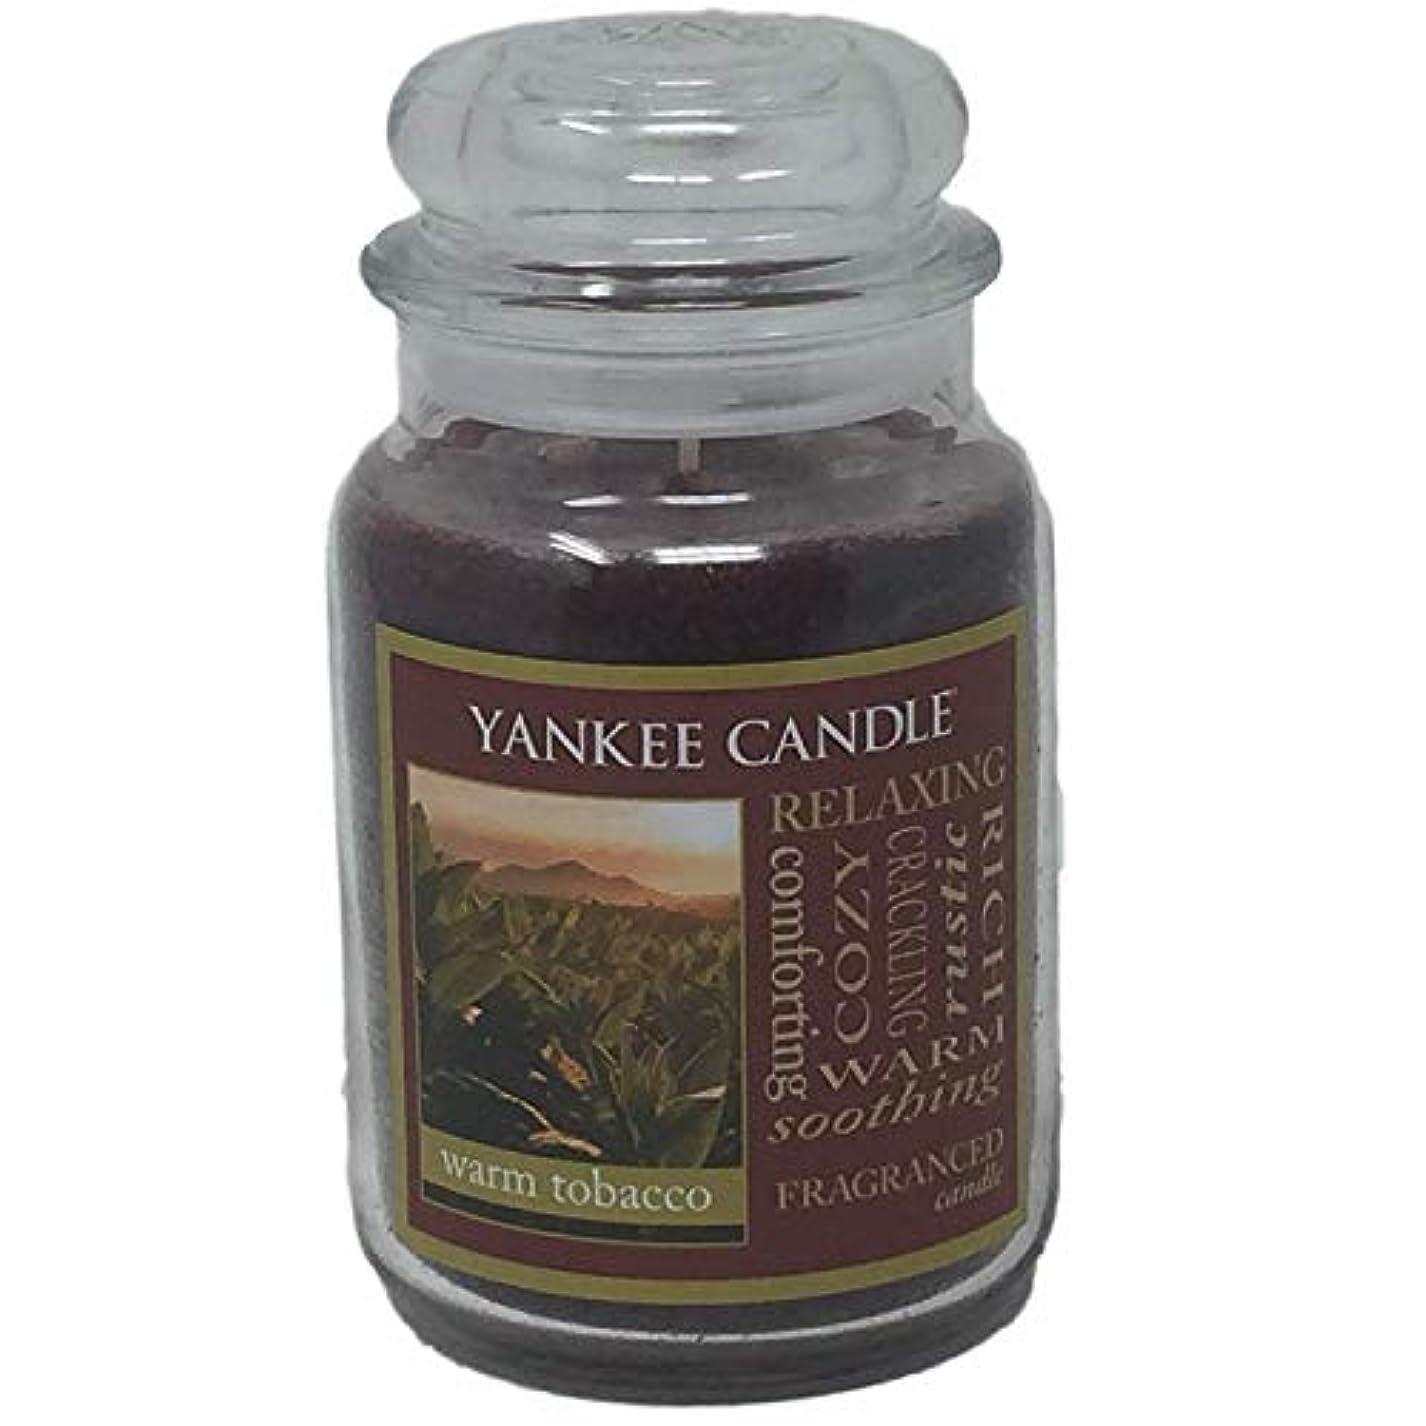 Yankee Candle WarmタバコJar Candle – 22 oz Largeサイズ